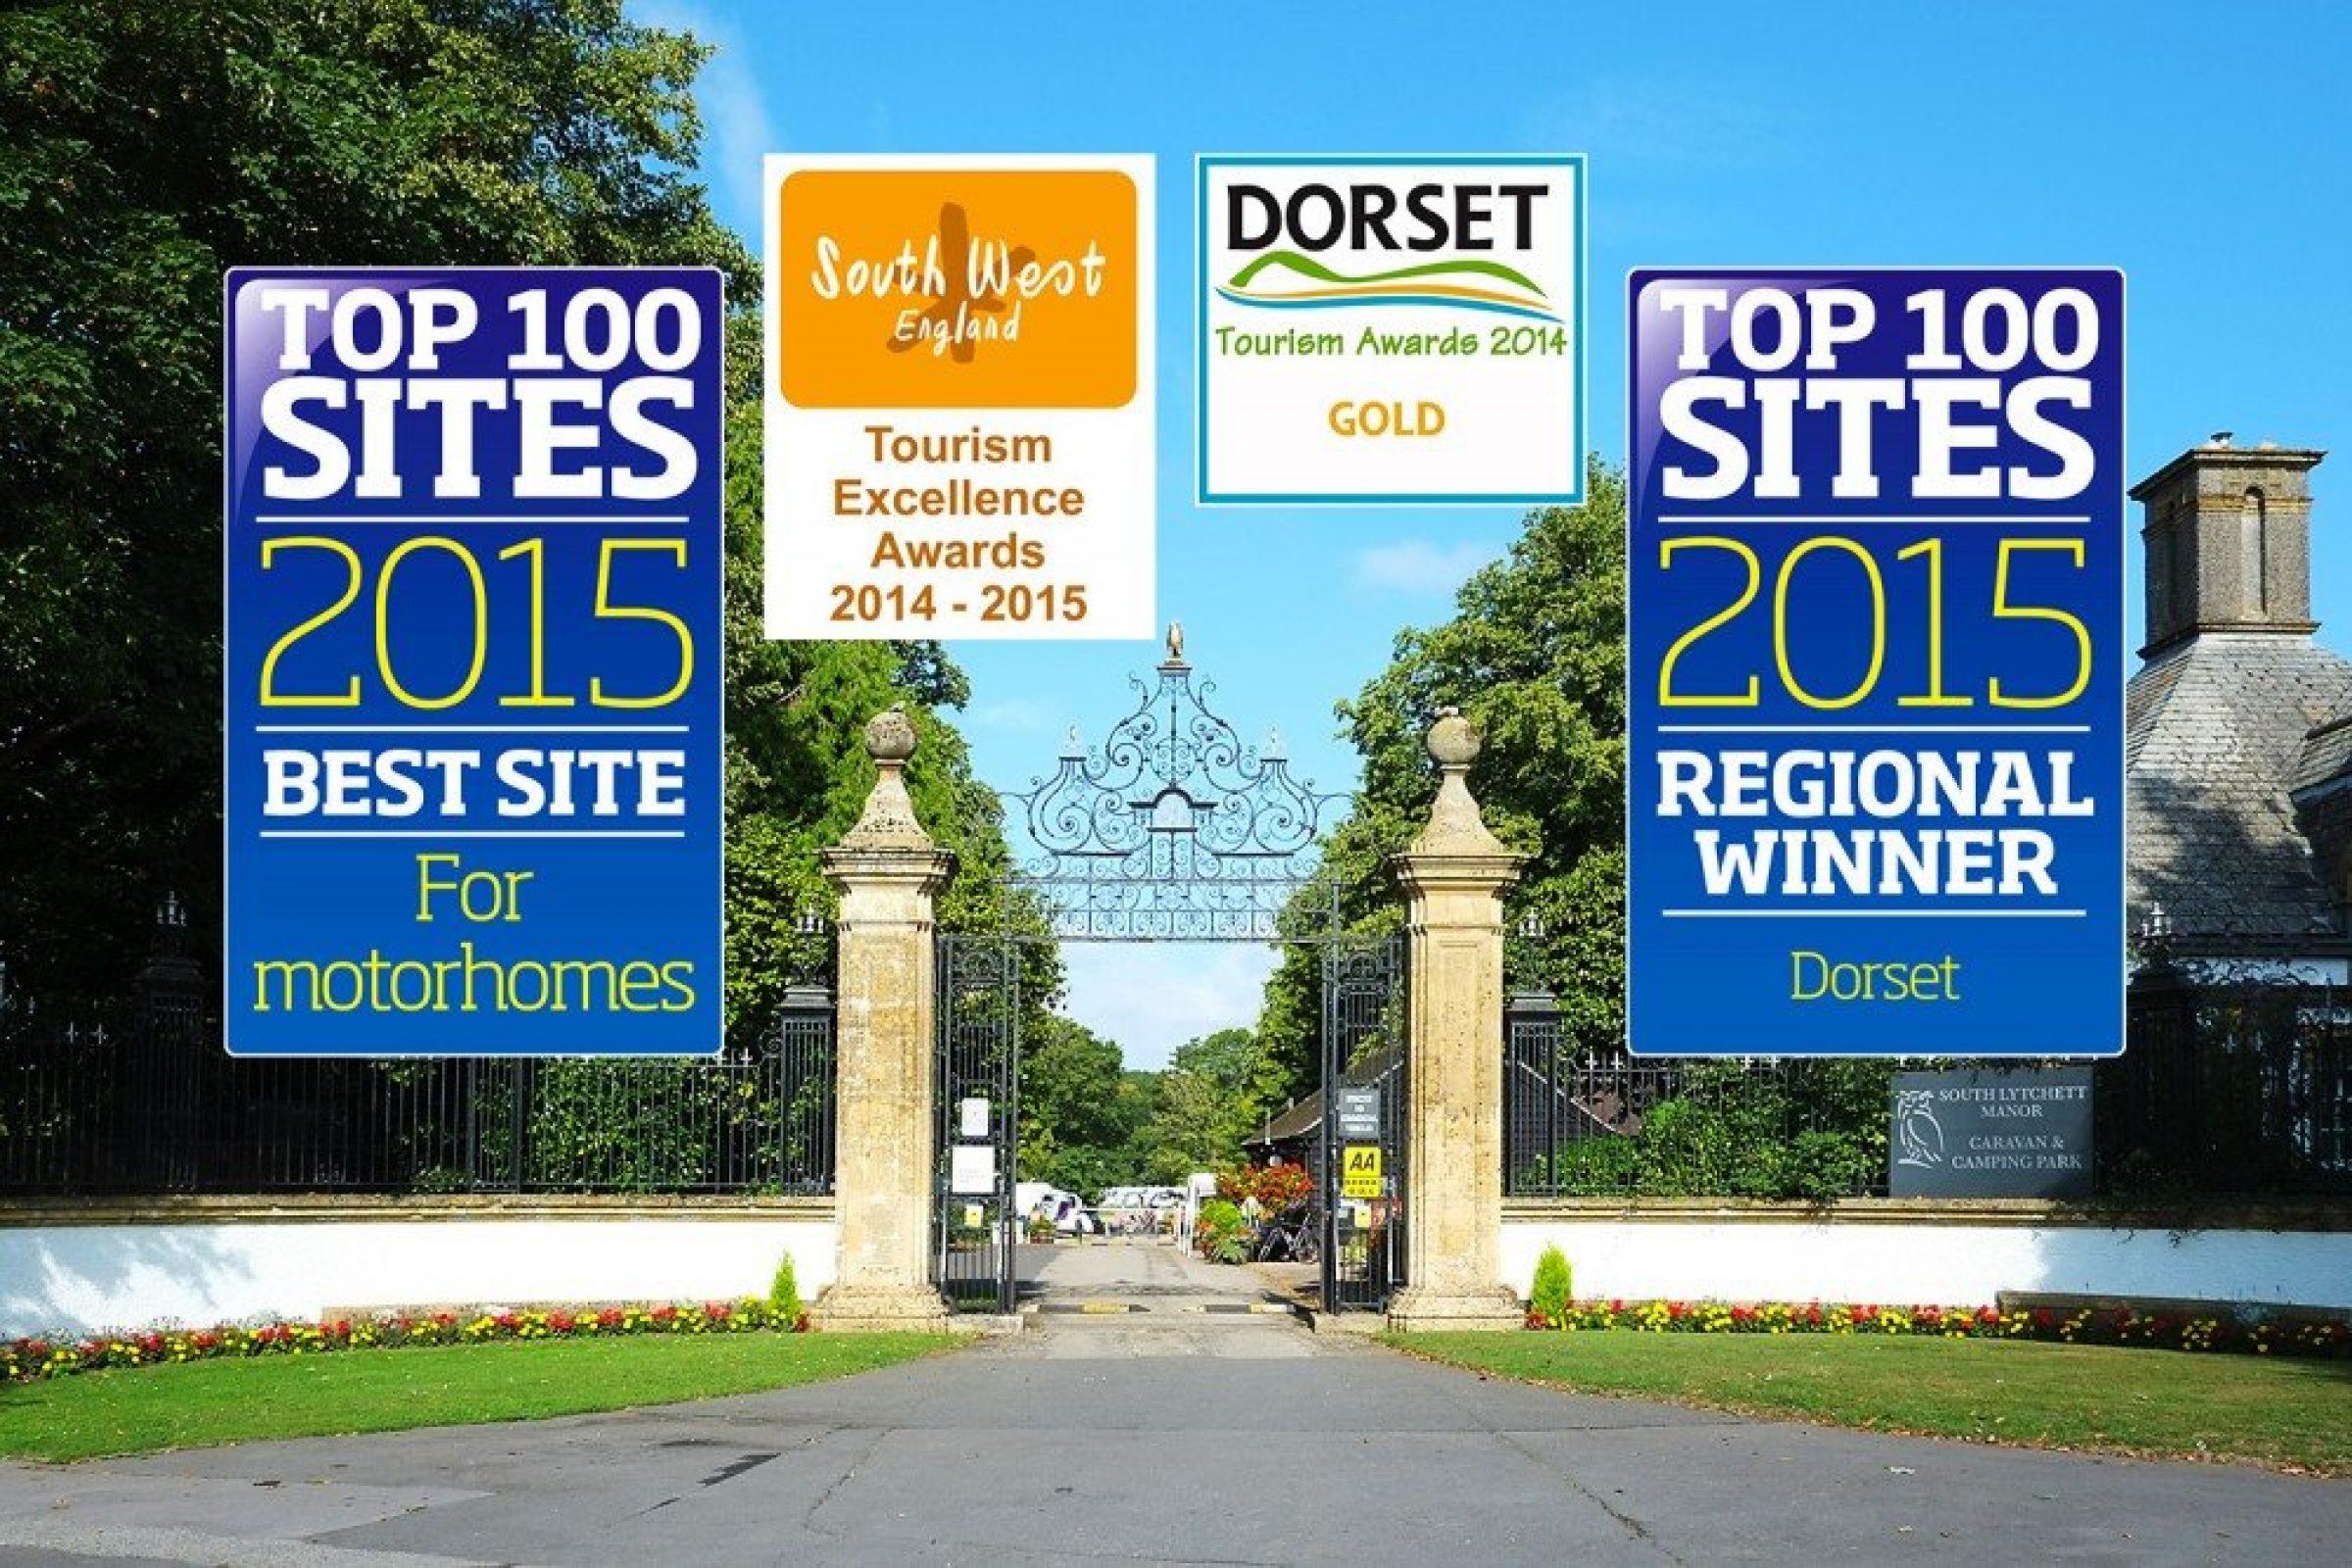 Top park in UK for motorhomes